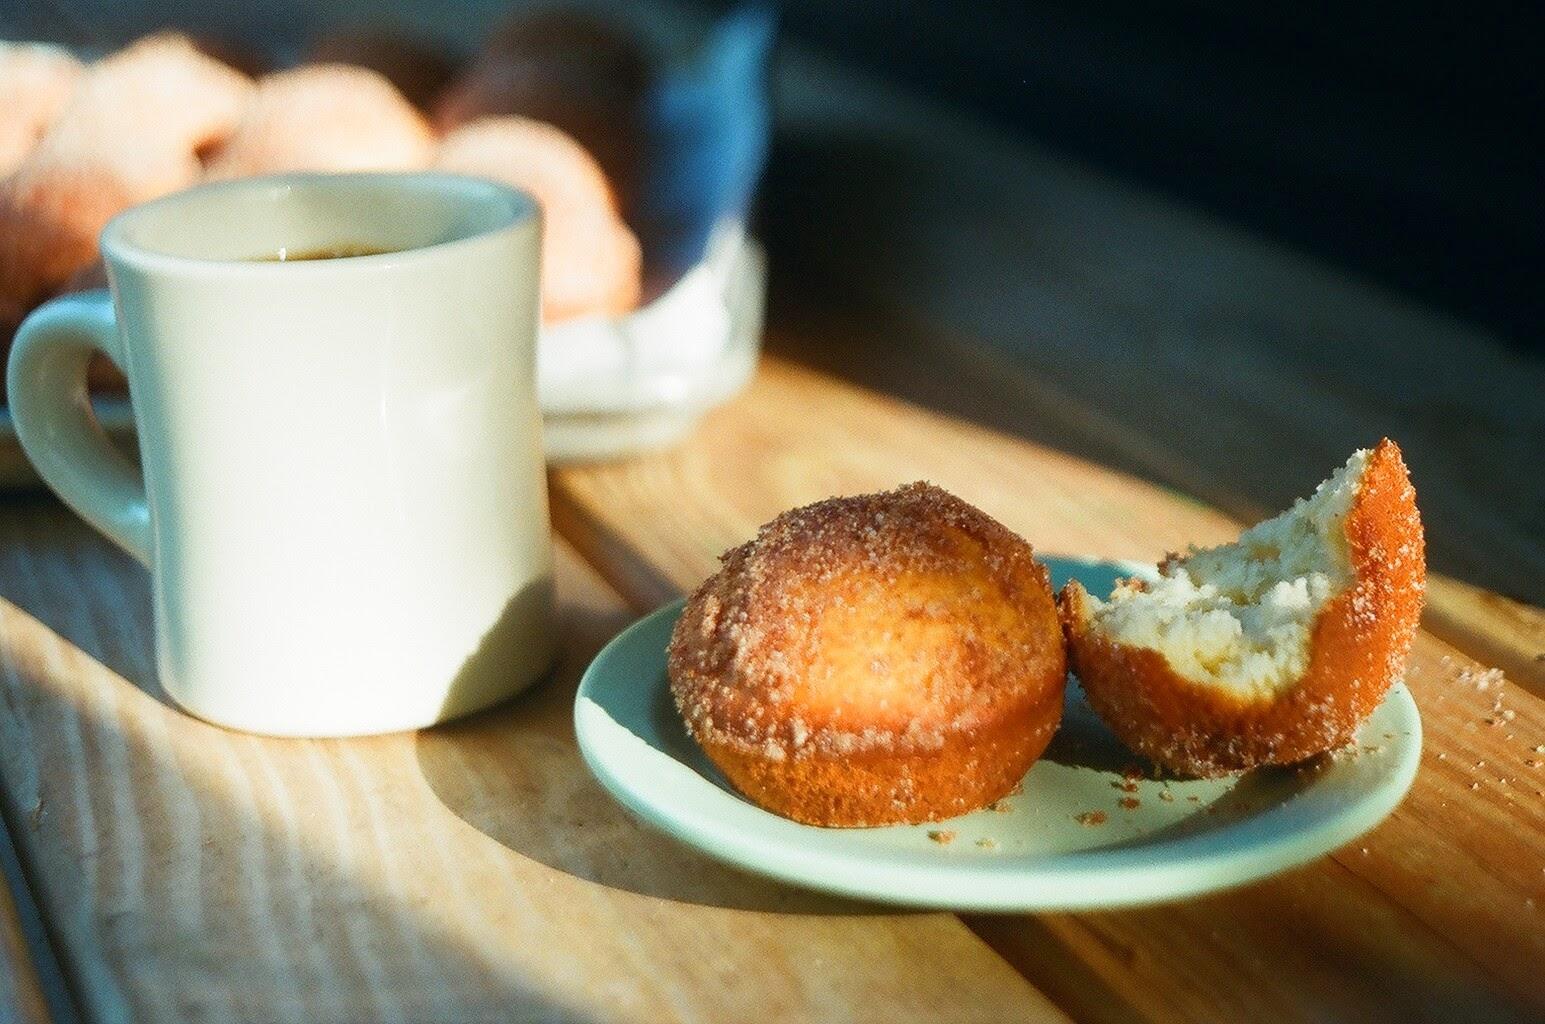 Cardamom Doughnut Muffins and Coffee